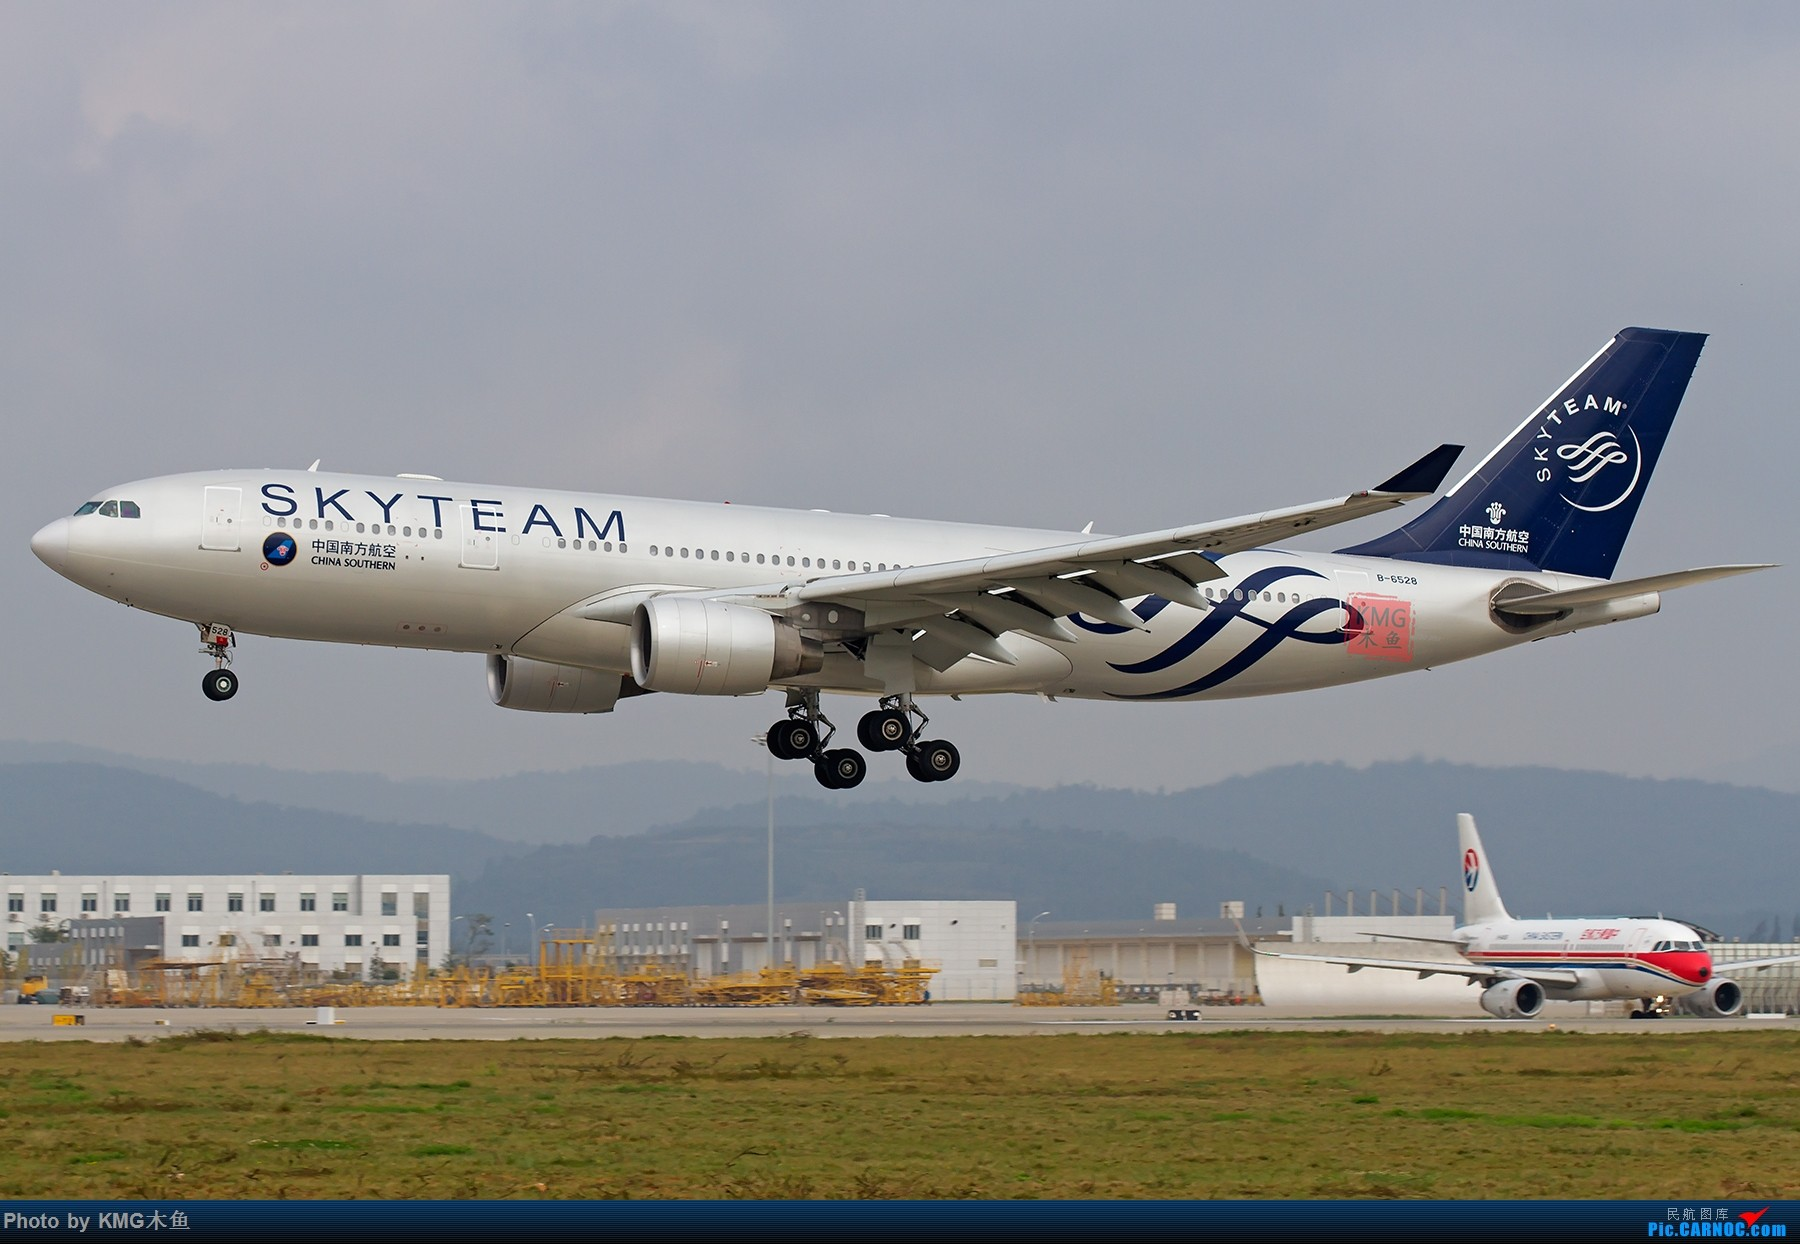 Re:[原创]【昆明长水国际机场—KMG木鱼10.16日拍机】周末拍机,有宽体,有彩绘,少了小伙伴们,独自一人拍机 AIRBUS A330-200 B-6528 中国昆明长水国际机场